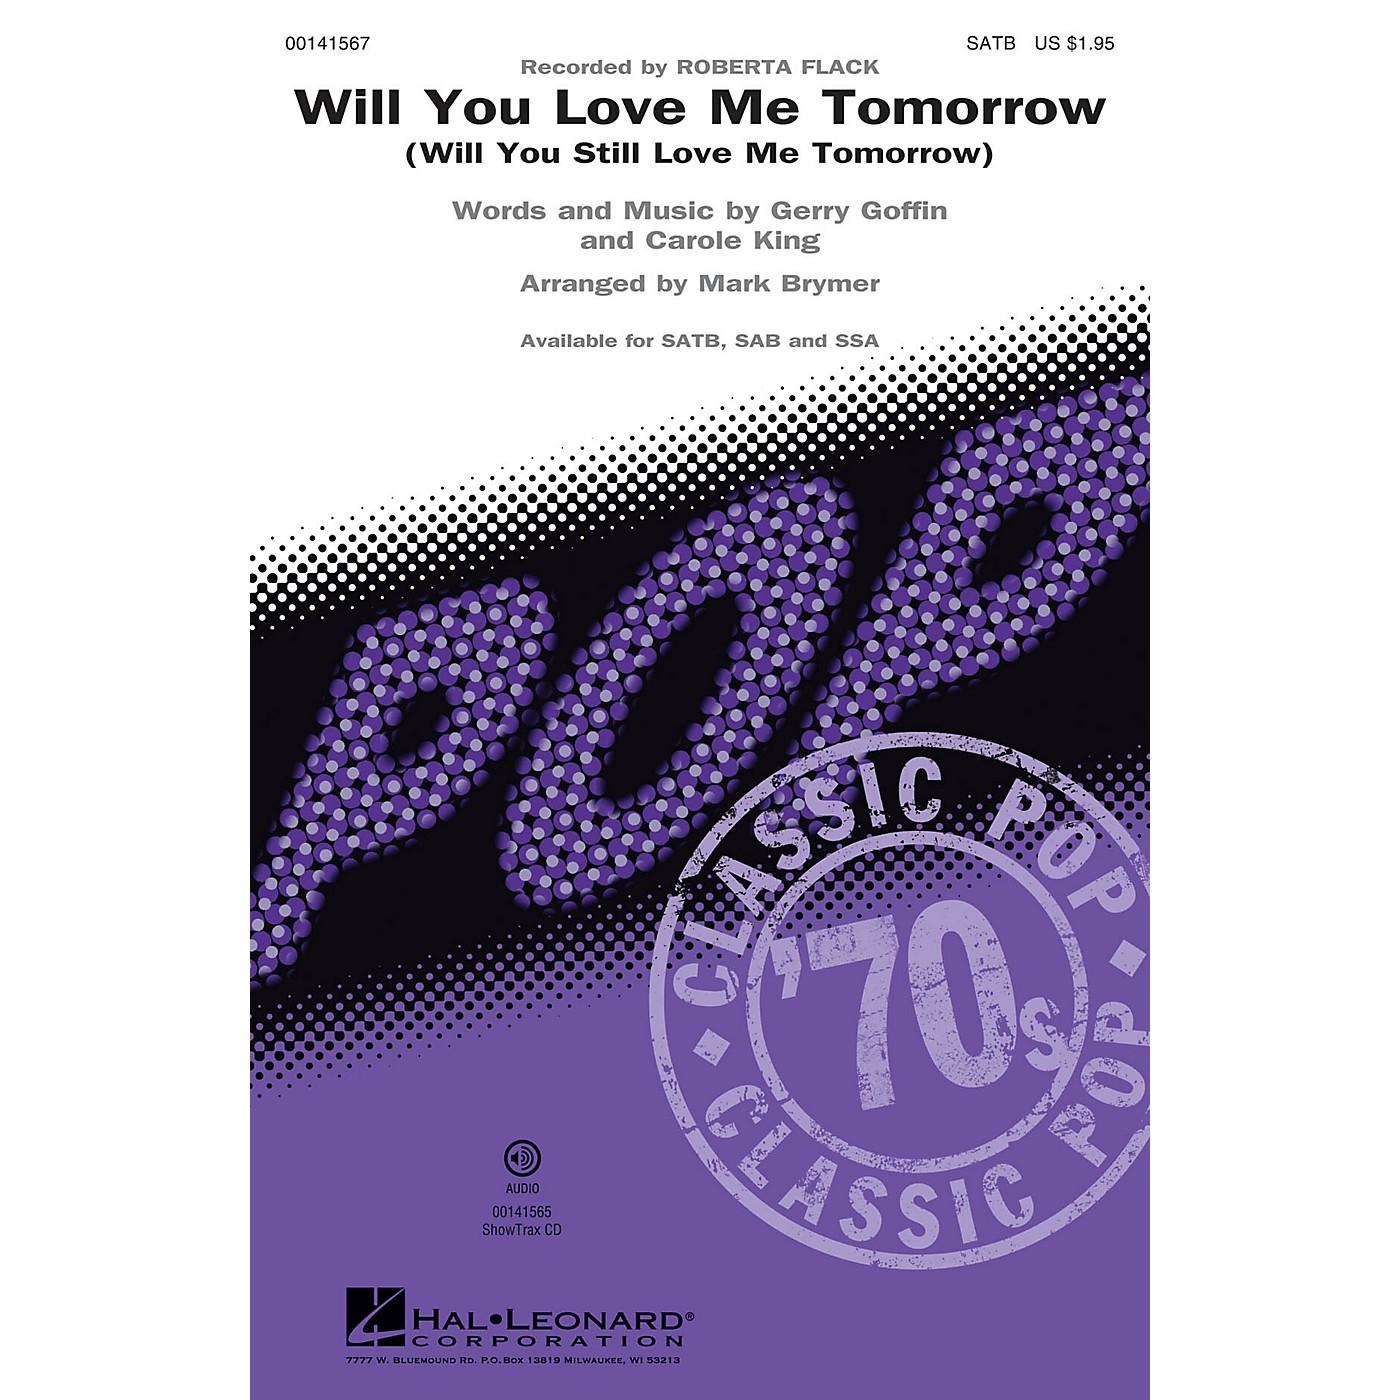 Hal Leonard Will You Love Me Tomorrow (Will You Still Love Me Tomorrow) SATB by Roberta Flack arranged by Mark Brymer thumbnail